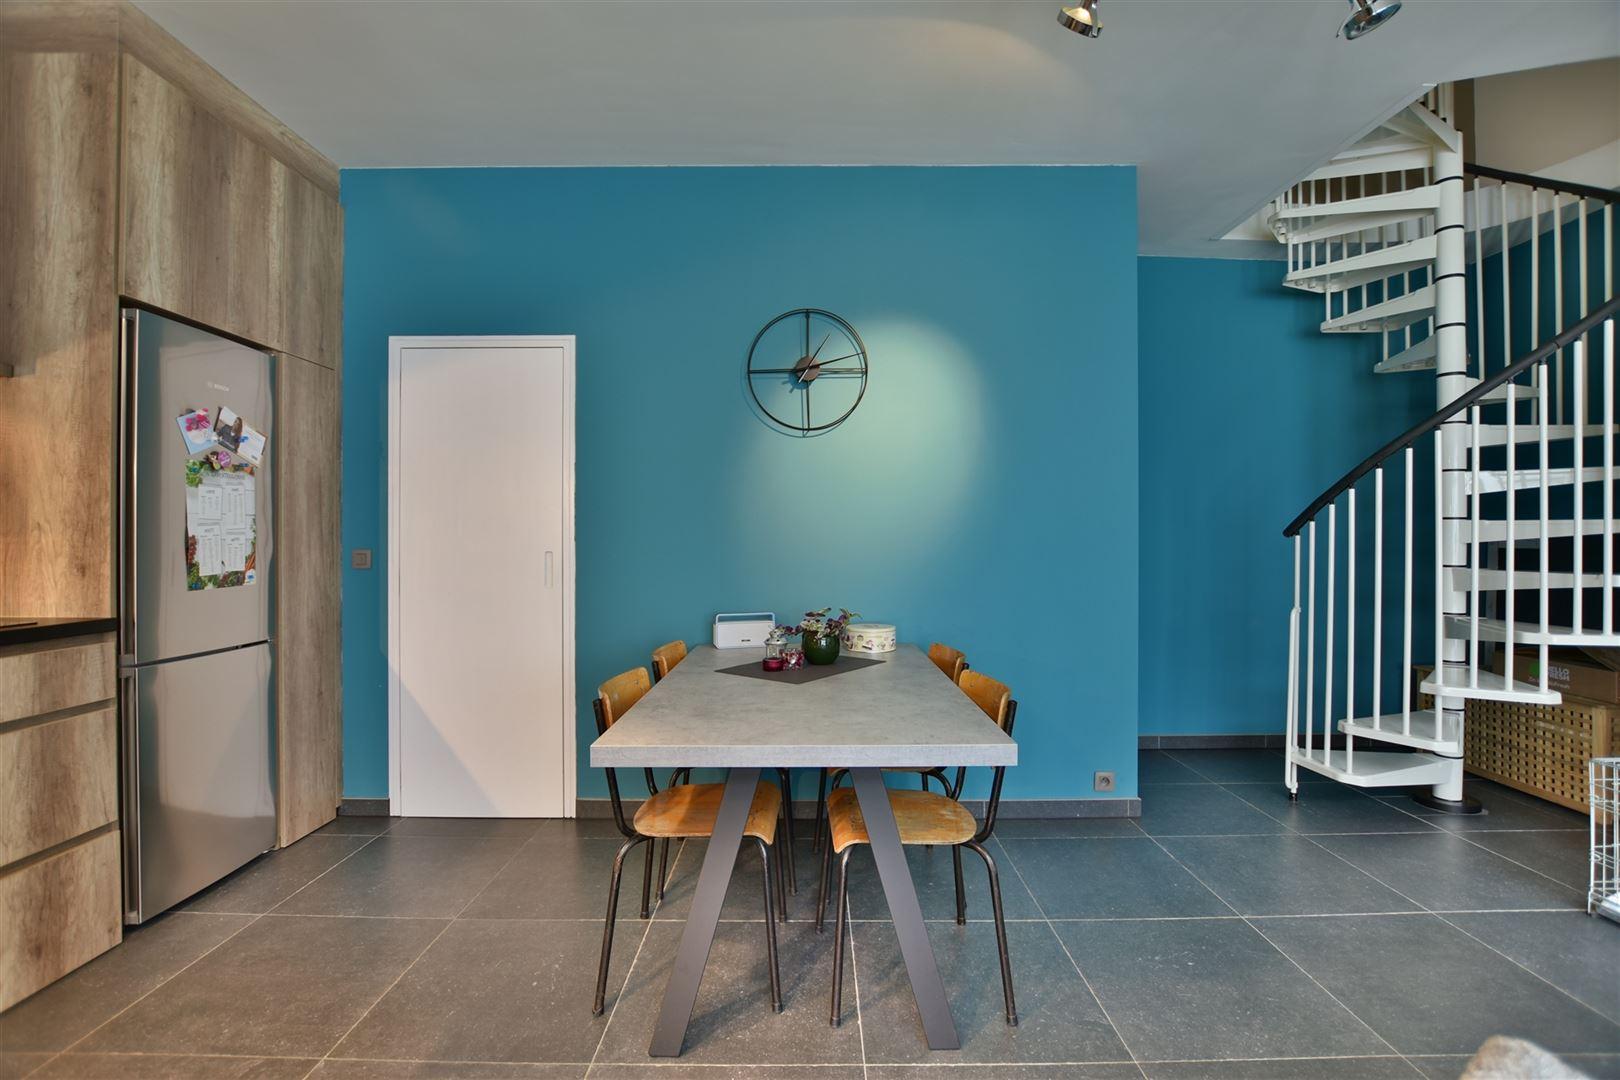 Foto 4 : Appartement te 9200 DENDERMONDE (België) - Prijs € 199.000